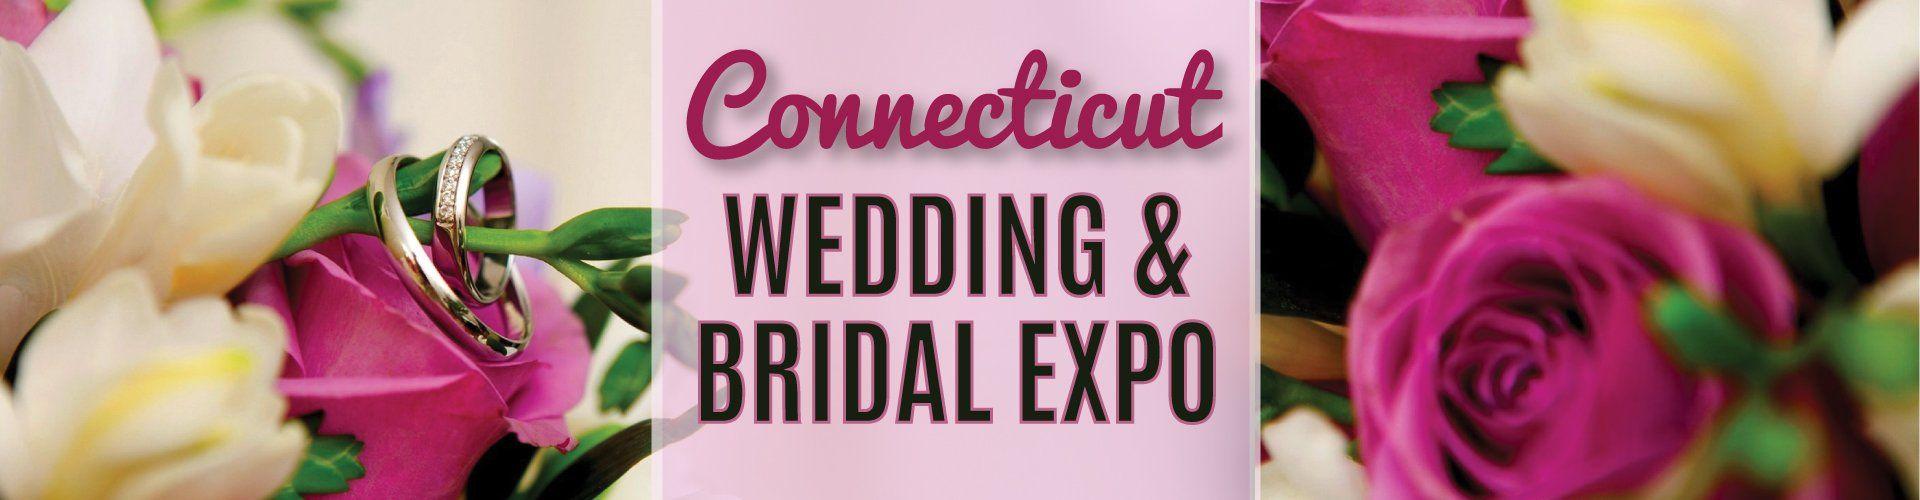 Connecticut Wedding & Bridal Expo 2020 Bridal expo